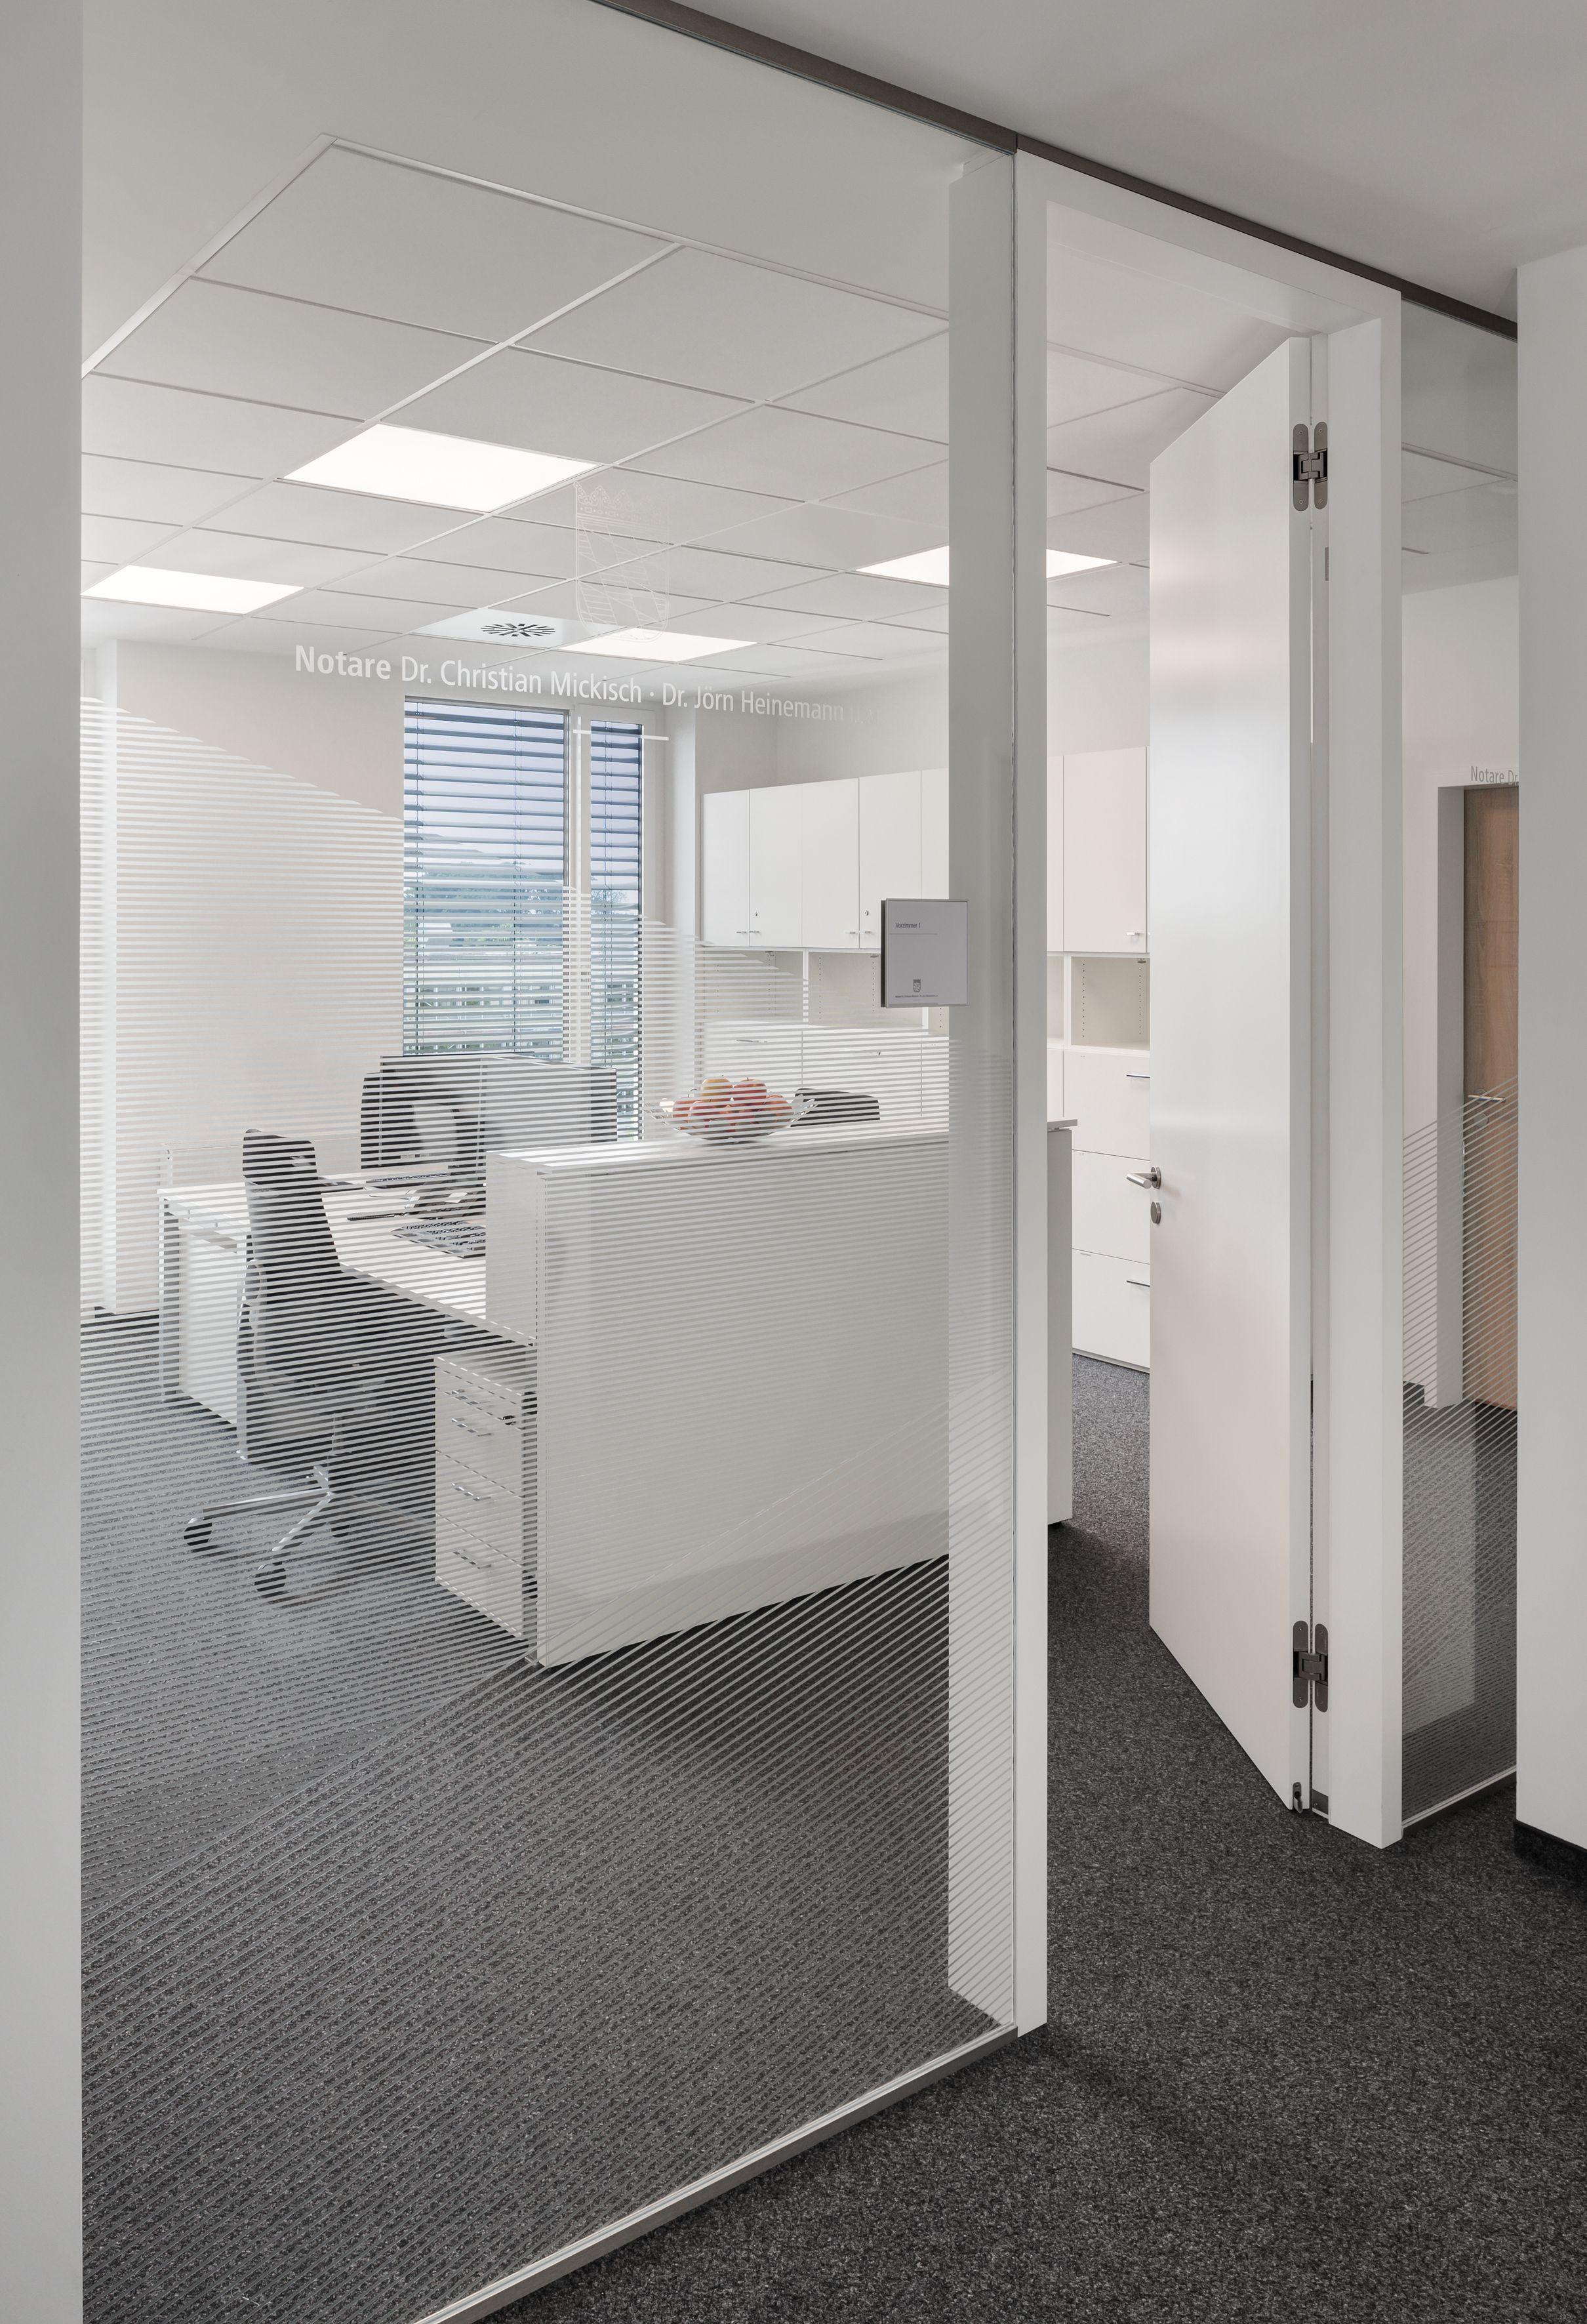 Ergonomischer bürostuhl holz  Glas, Trennwand, ergonomischer Bürostuhl, Raumtrenner, Stauraum ...